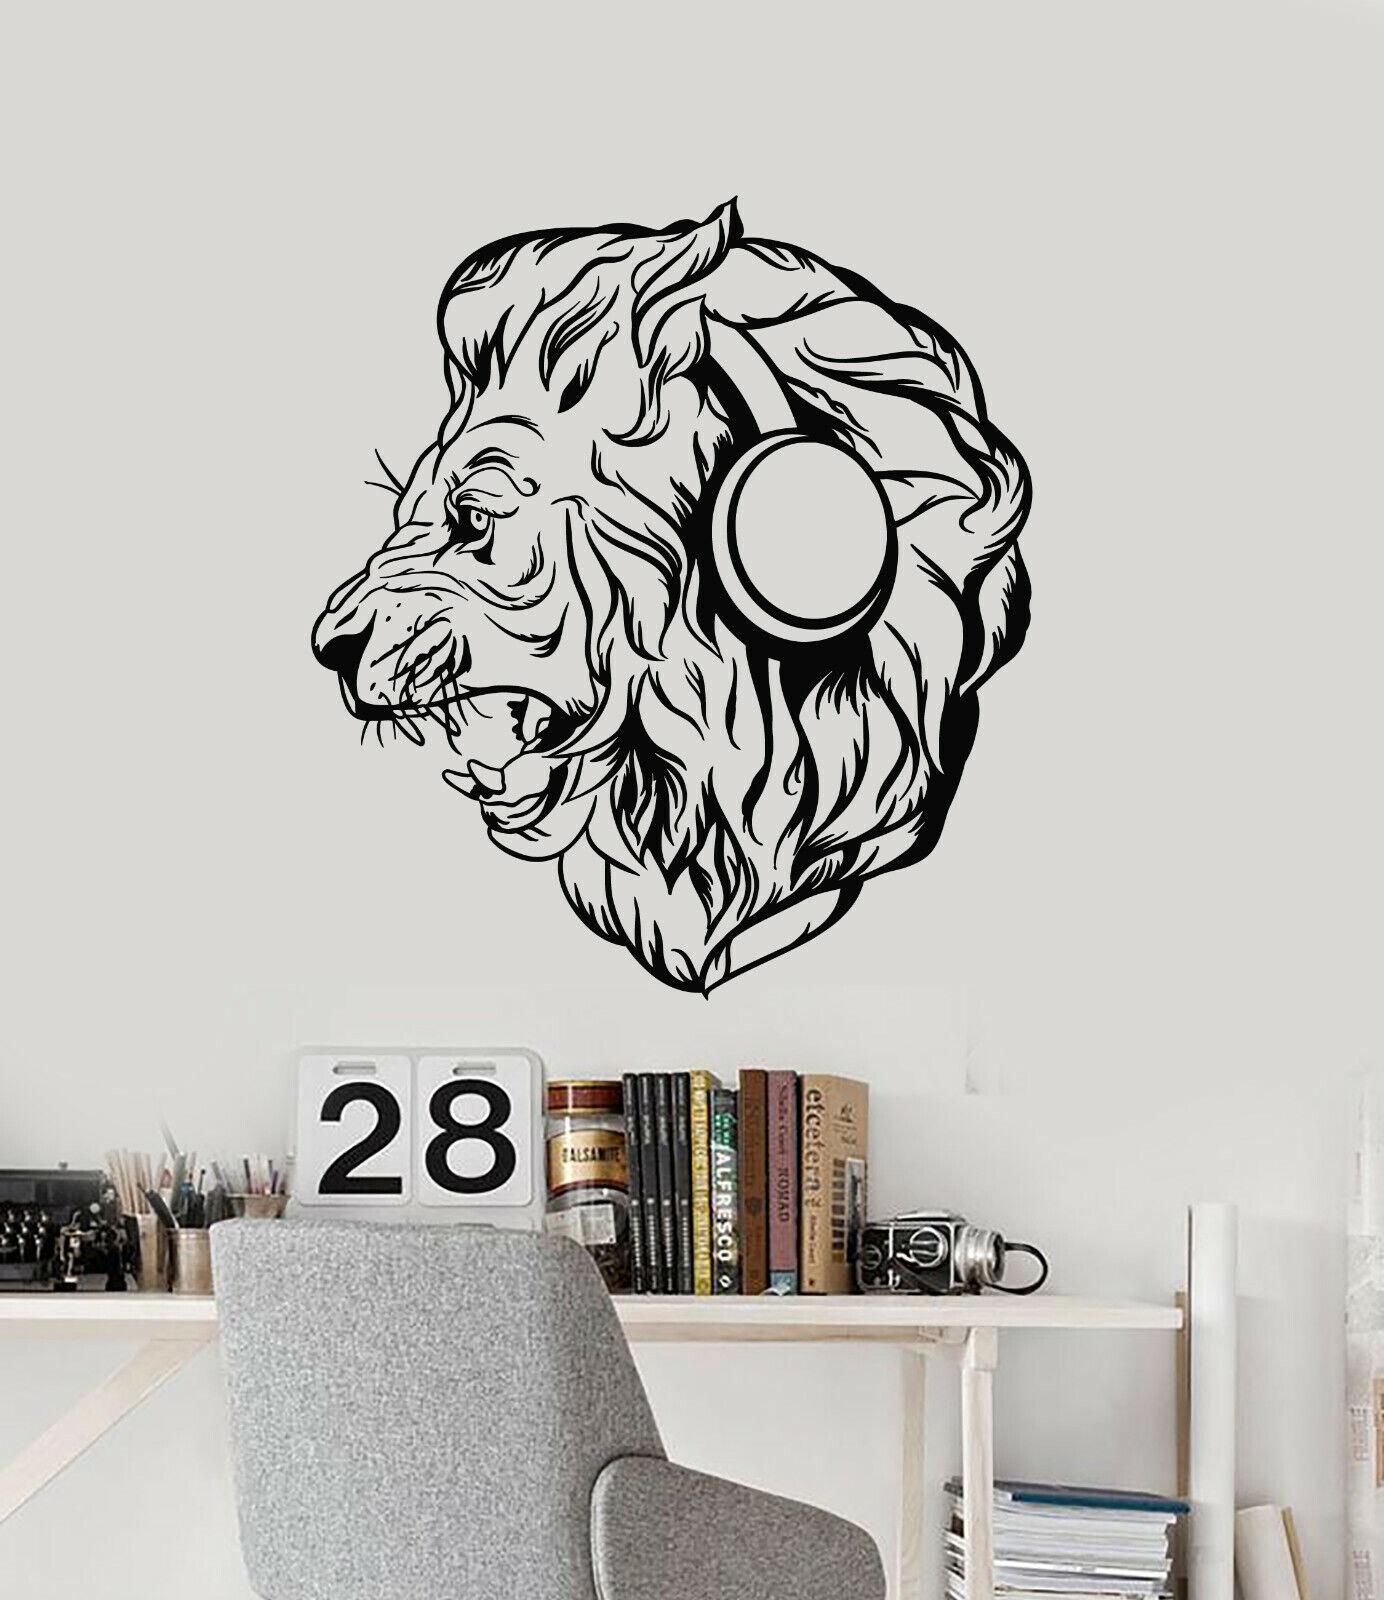 Vinyl Wall Decal Lion Head Headphones Music Animal Protator Stickers (g873)